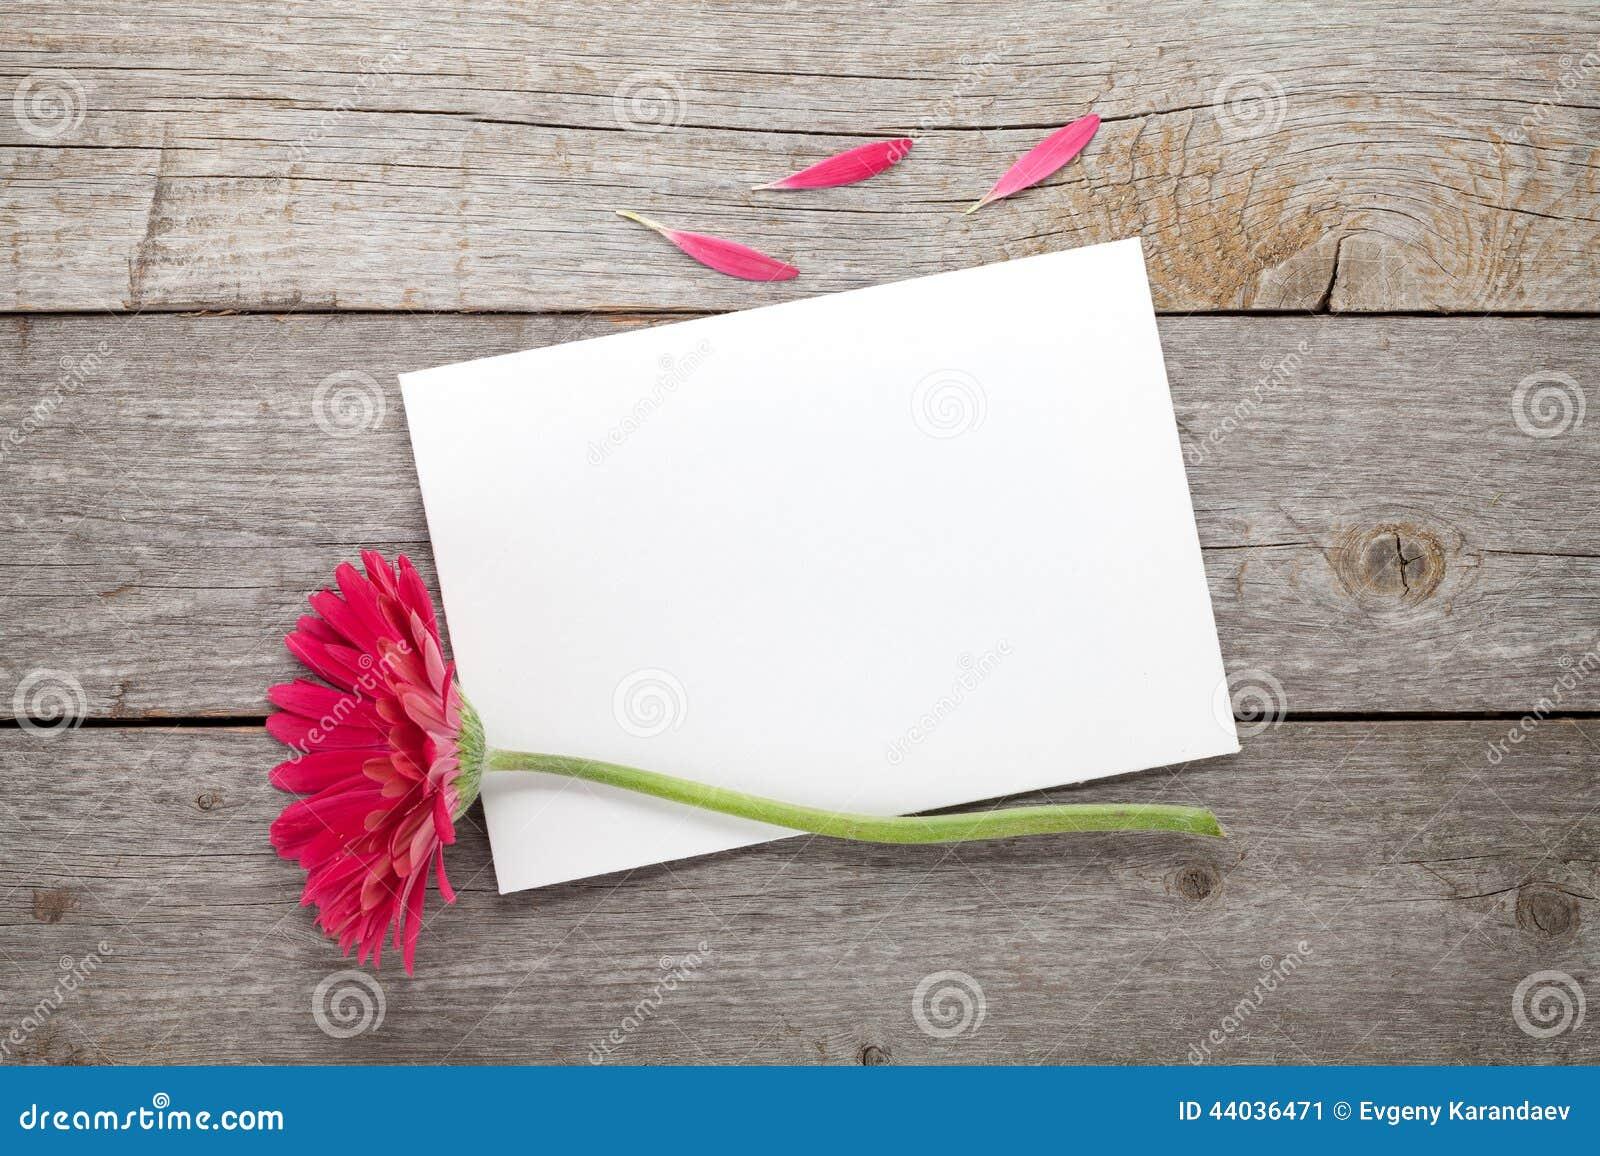 Purple gerbera flower and blank greeting card stock image image of purple gerbera flower and blank greeting card m4hsunfo